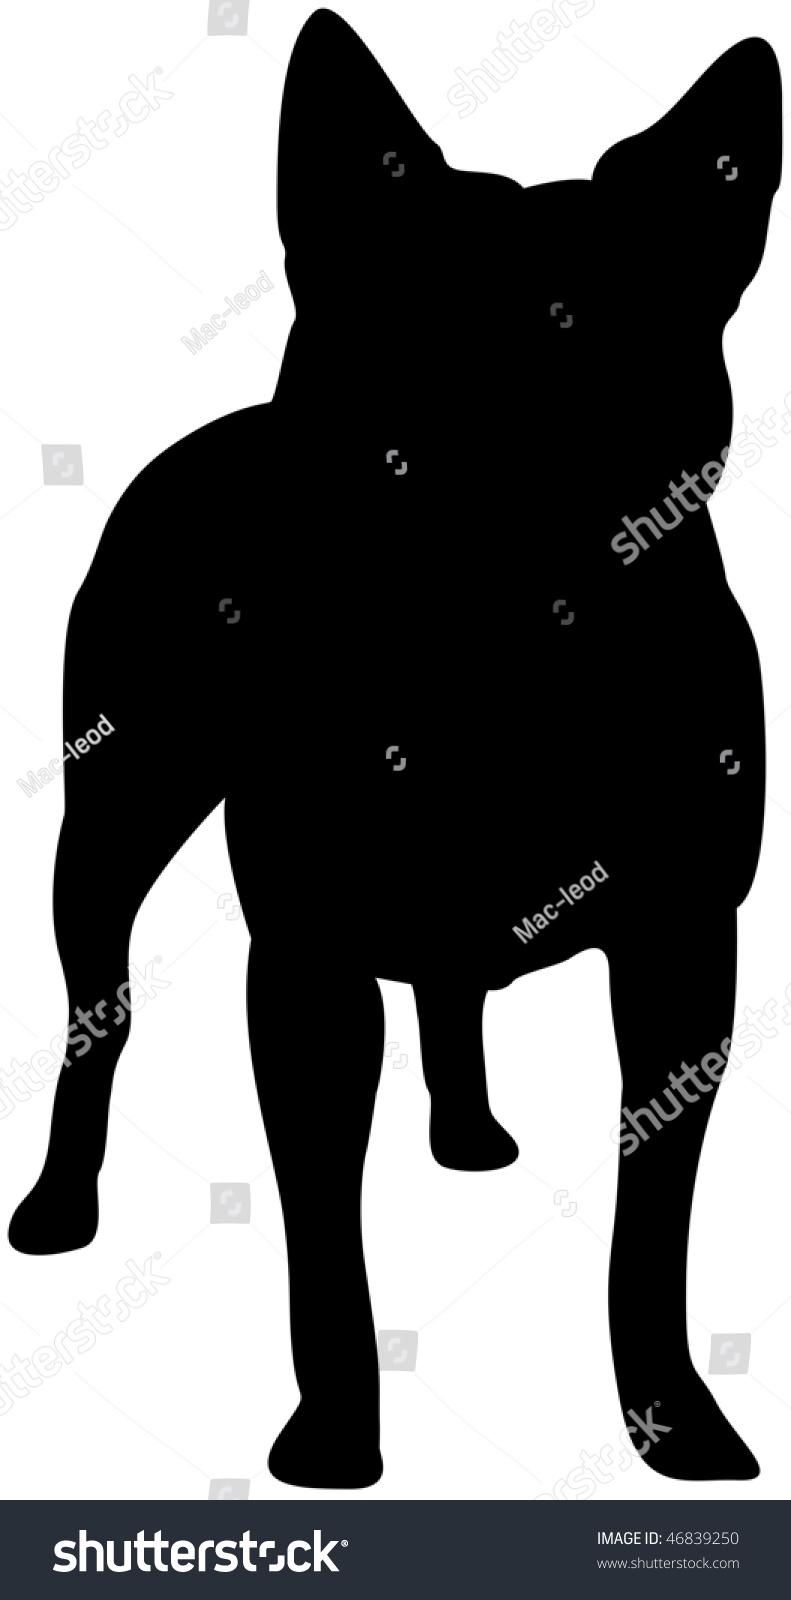 Australian Cattle Dog Silhouette Stock Photo 46839250